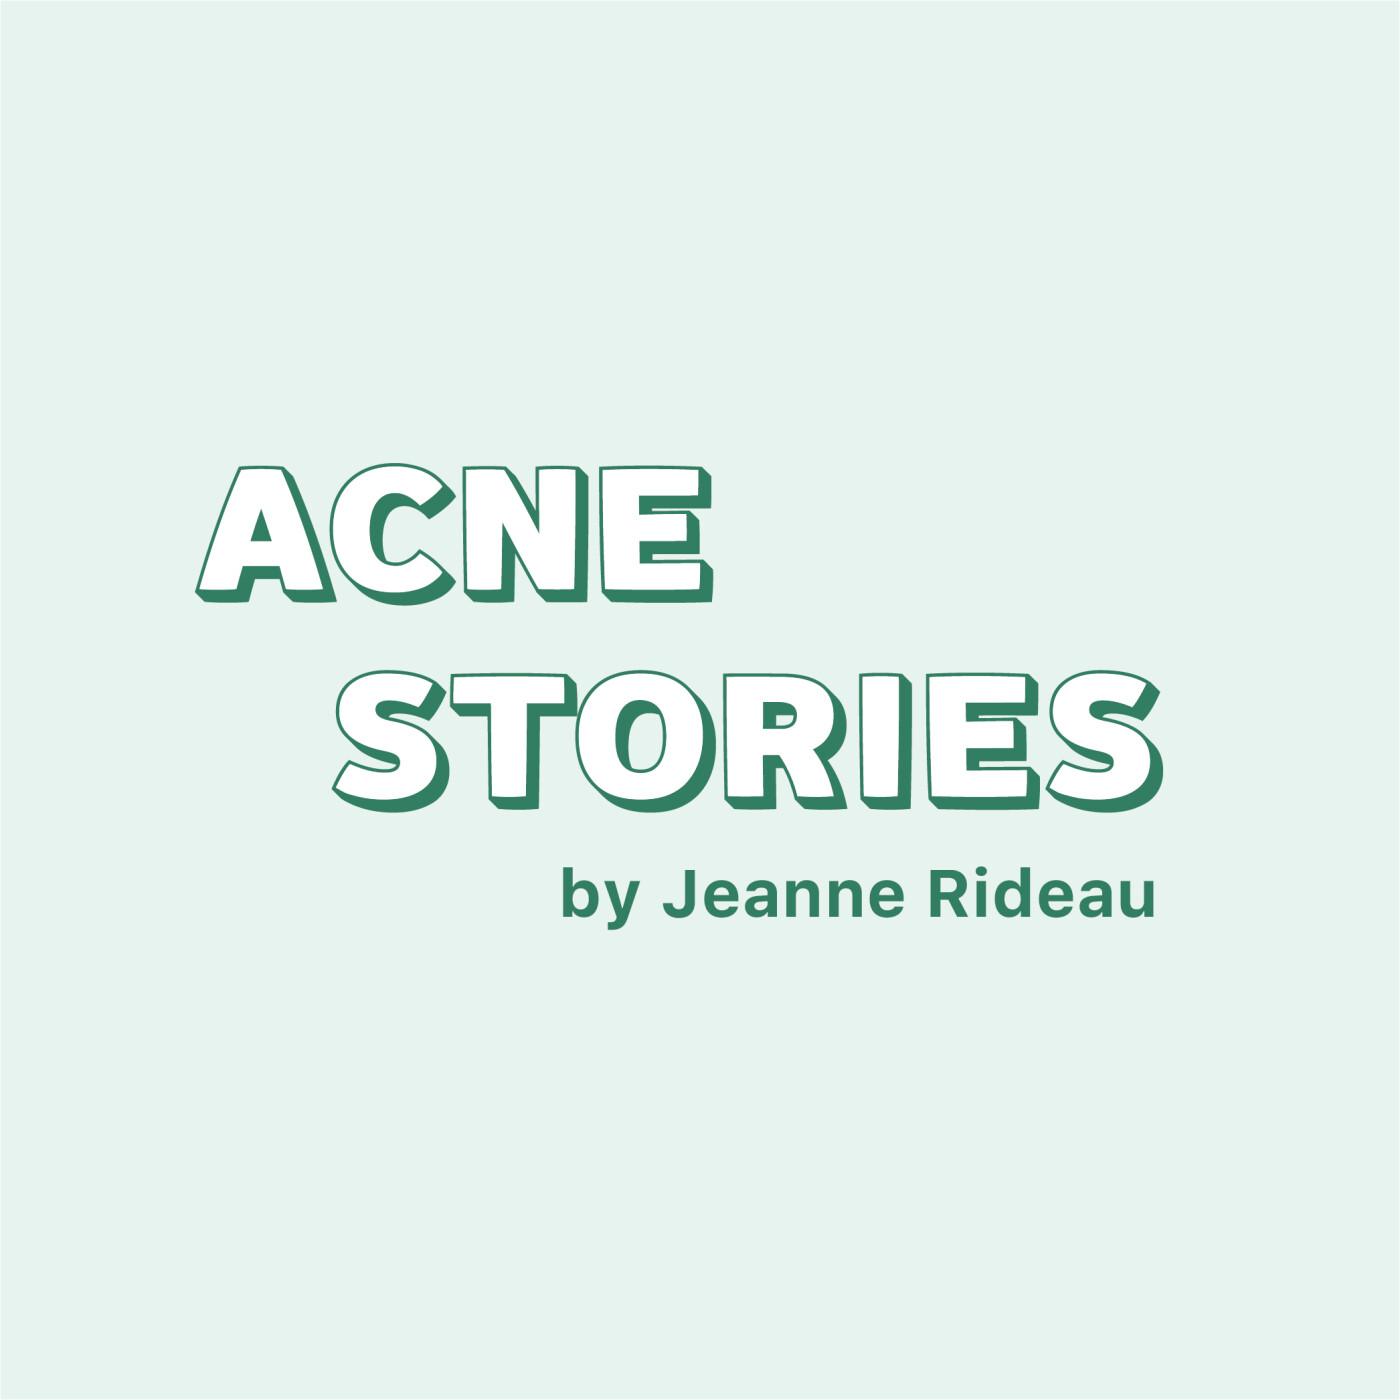 #6 My story